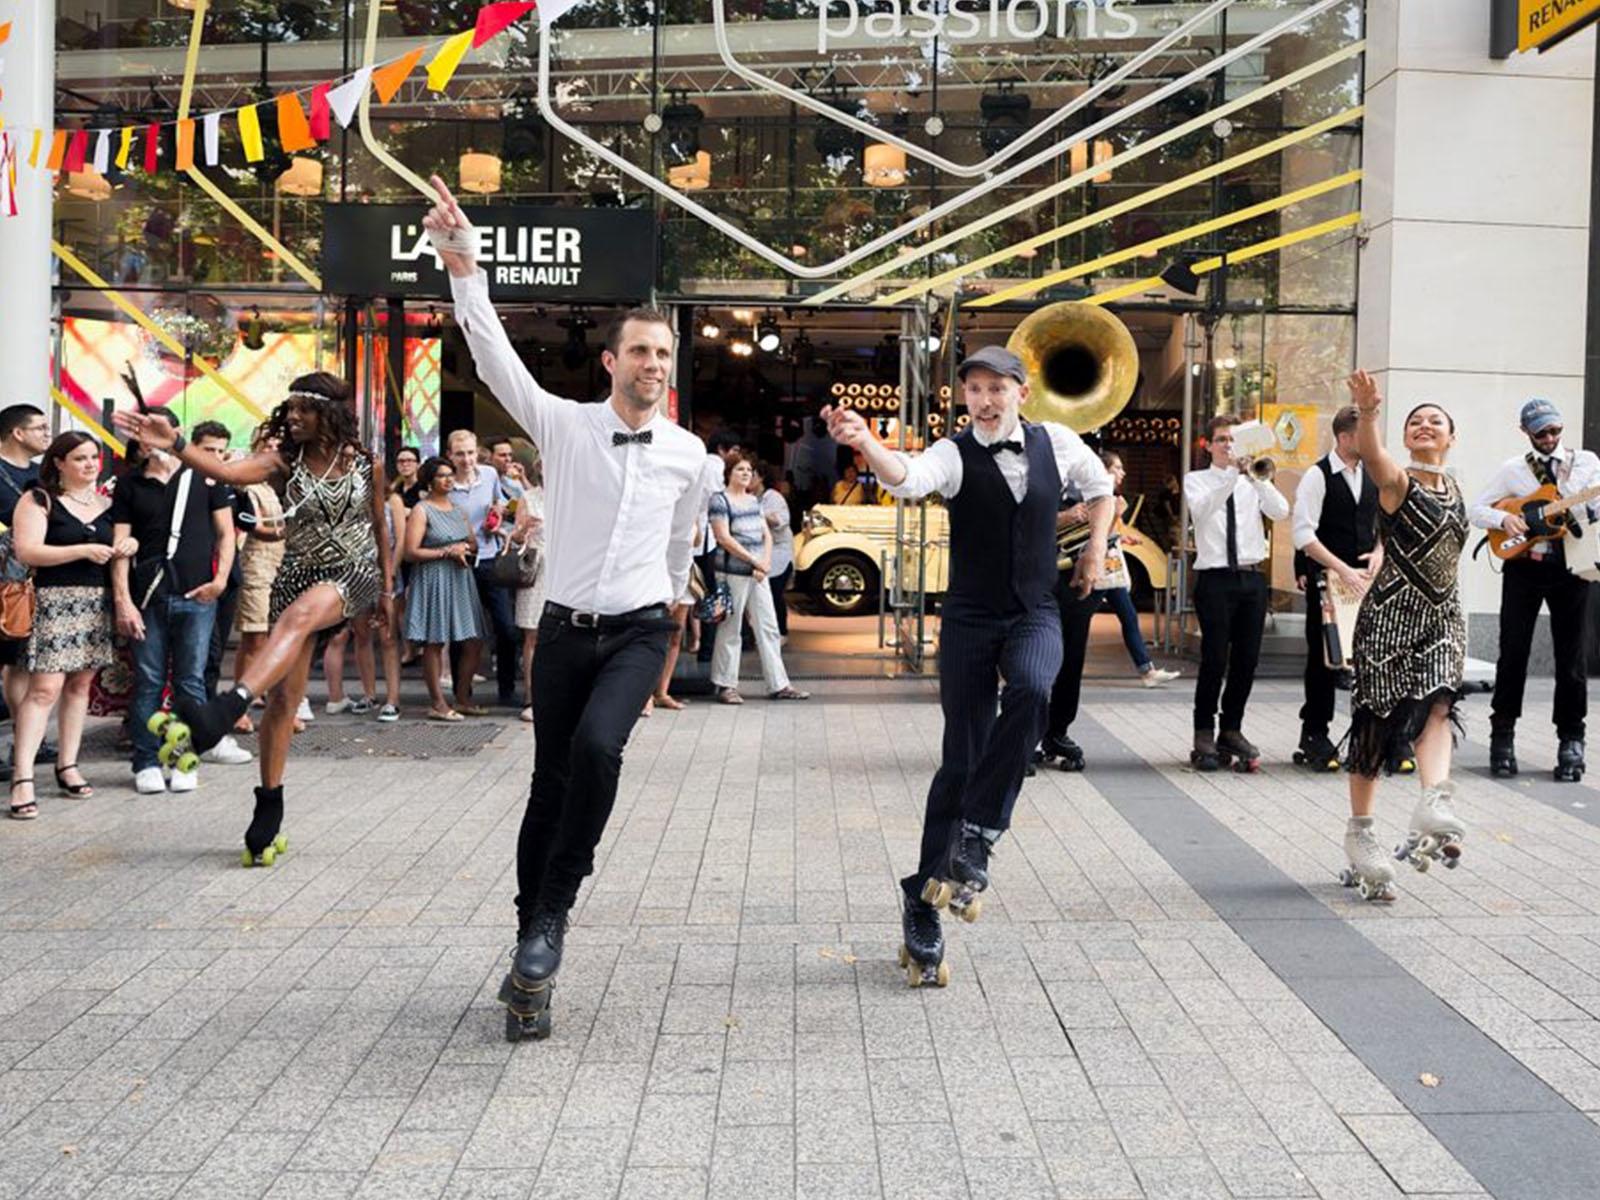 Roller dance show by SkateXpressv